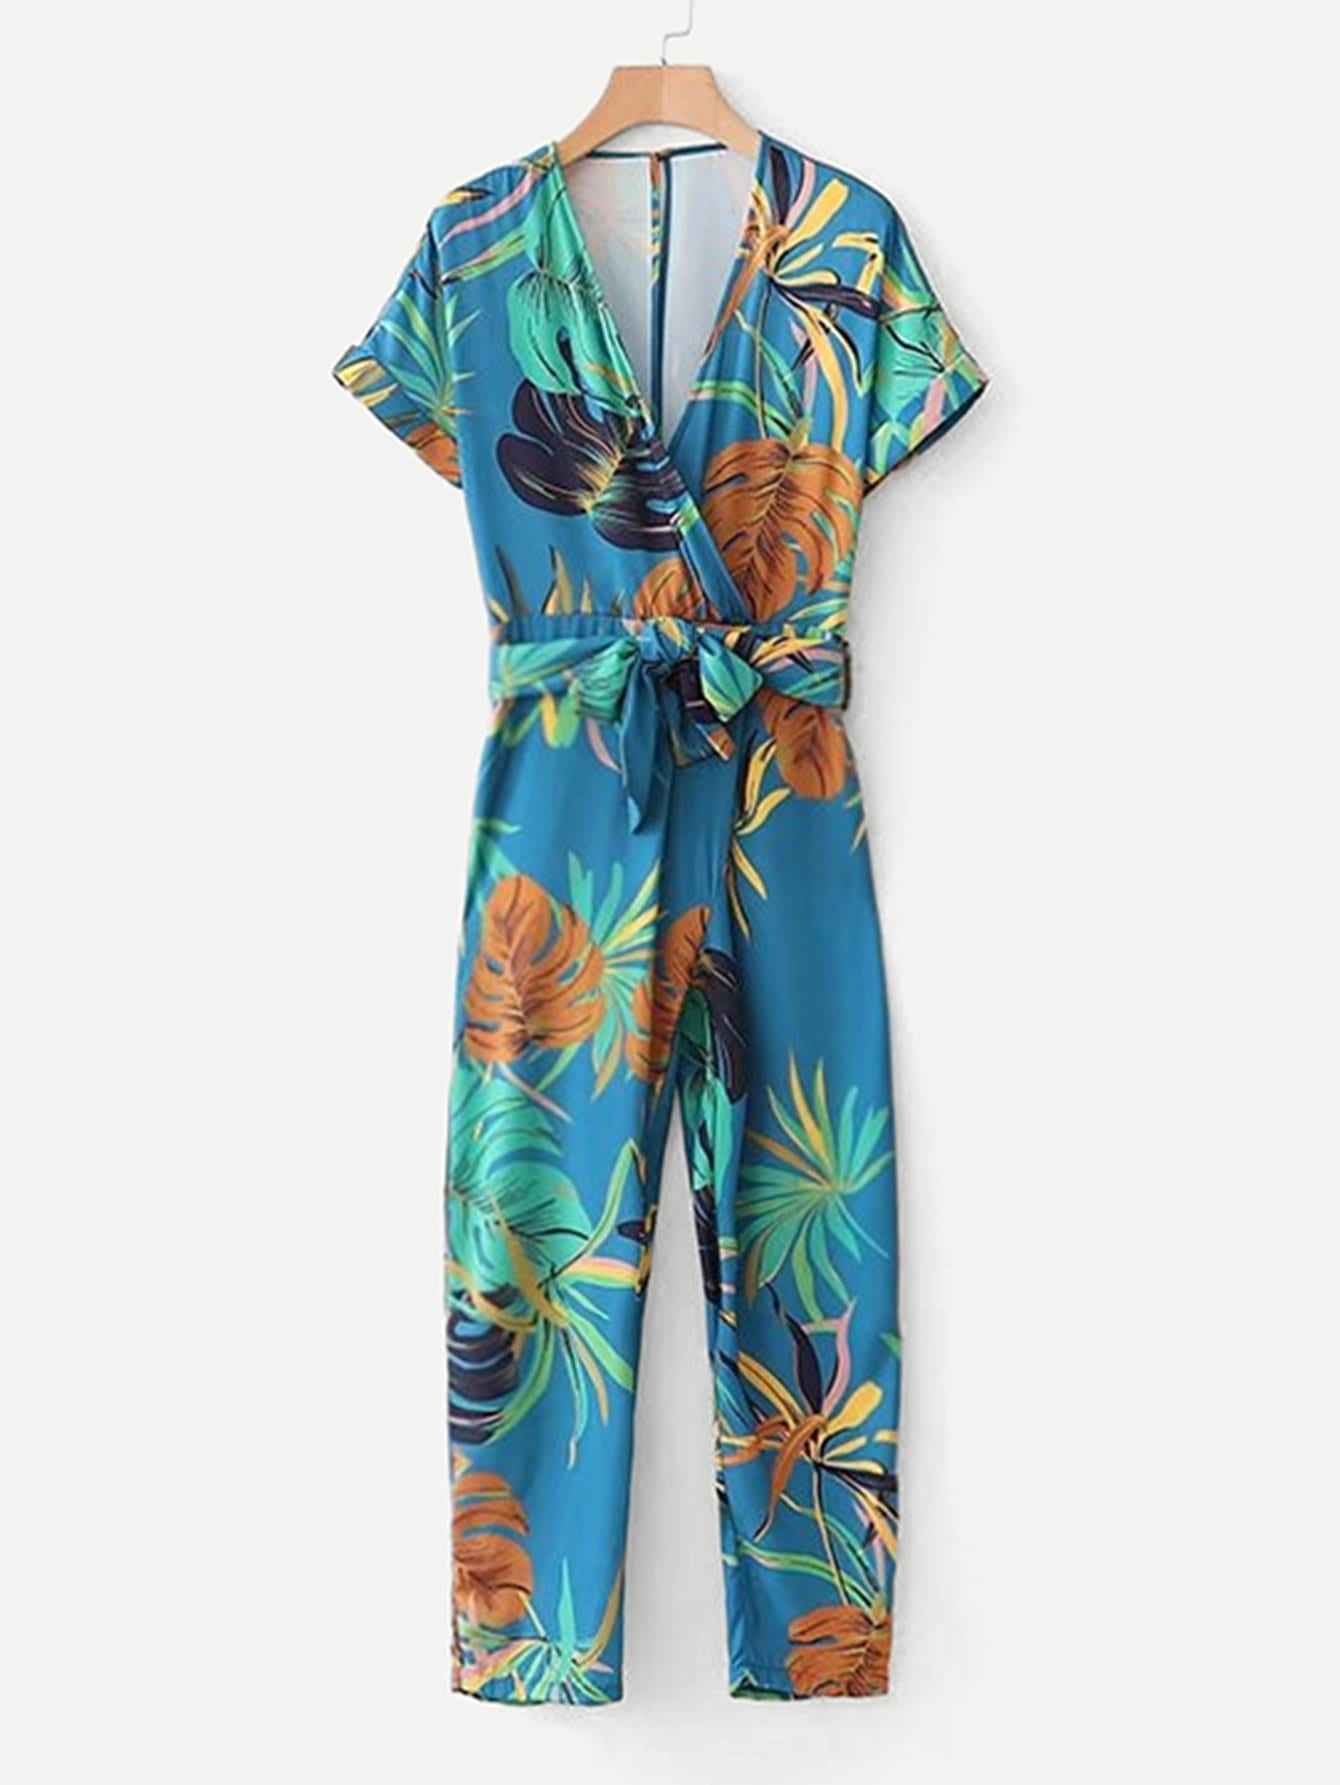 Foliage Print Surplice Neckline Belted Jumpsuit halter surplice floral print jumpsuit